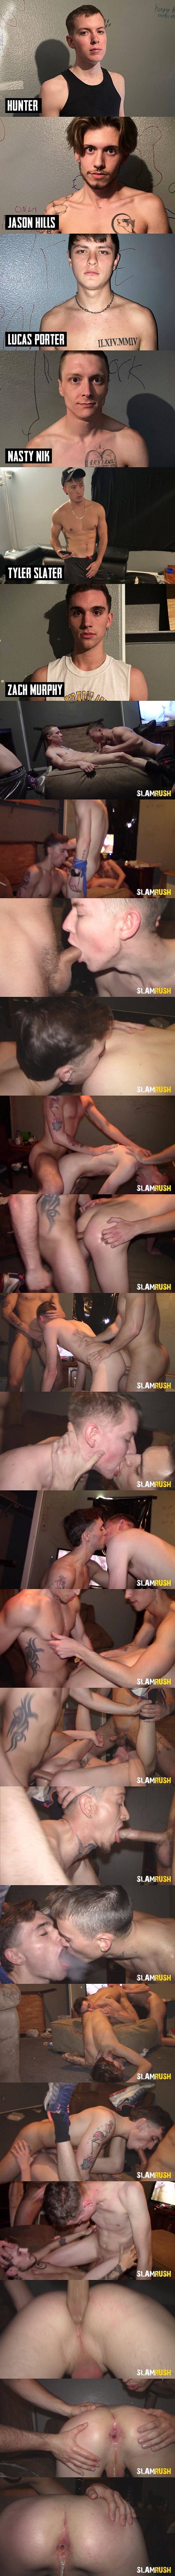 Slamrush - street slammers Jason Hills, Zach Murphy, Nasty Nik, Lucas Porter and Tyler Slater gangbang and creampie twink newbie Hunter in Dead End Dump 02